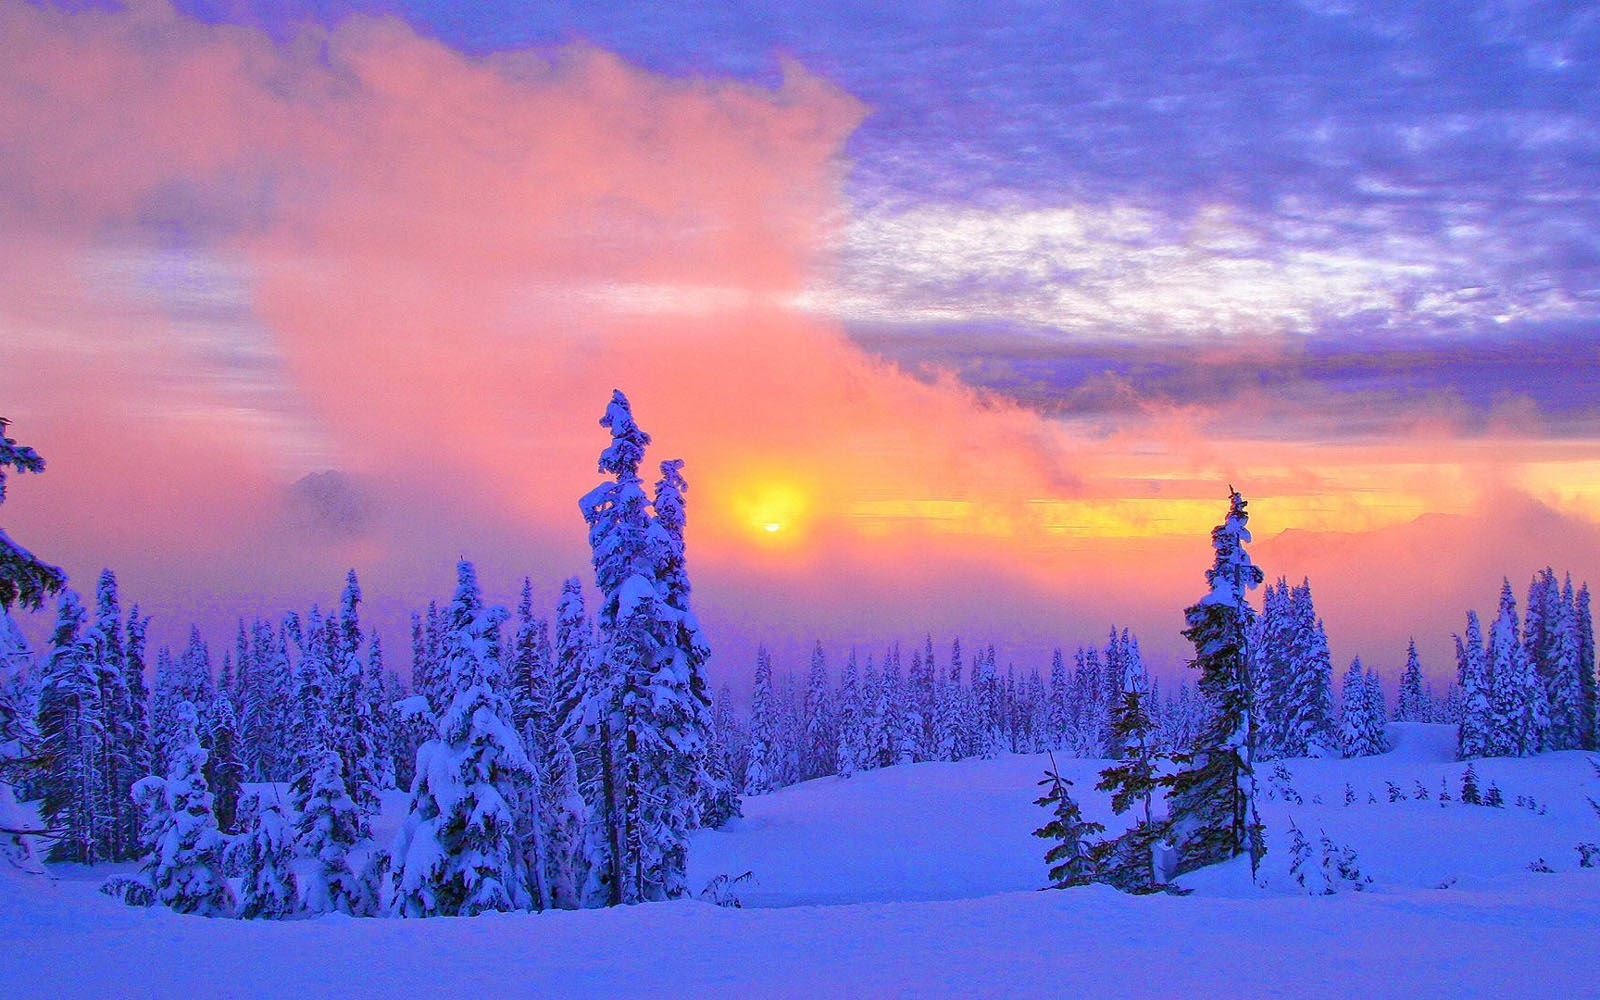 Wallpapers Beautiful Winter Scenery Desktop Backgrounds Beautiful 1600x1000